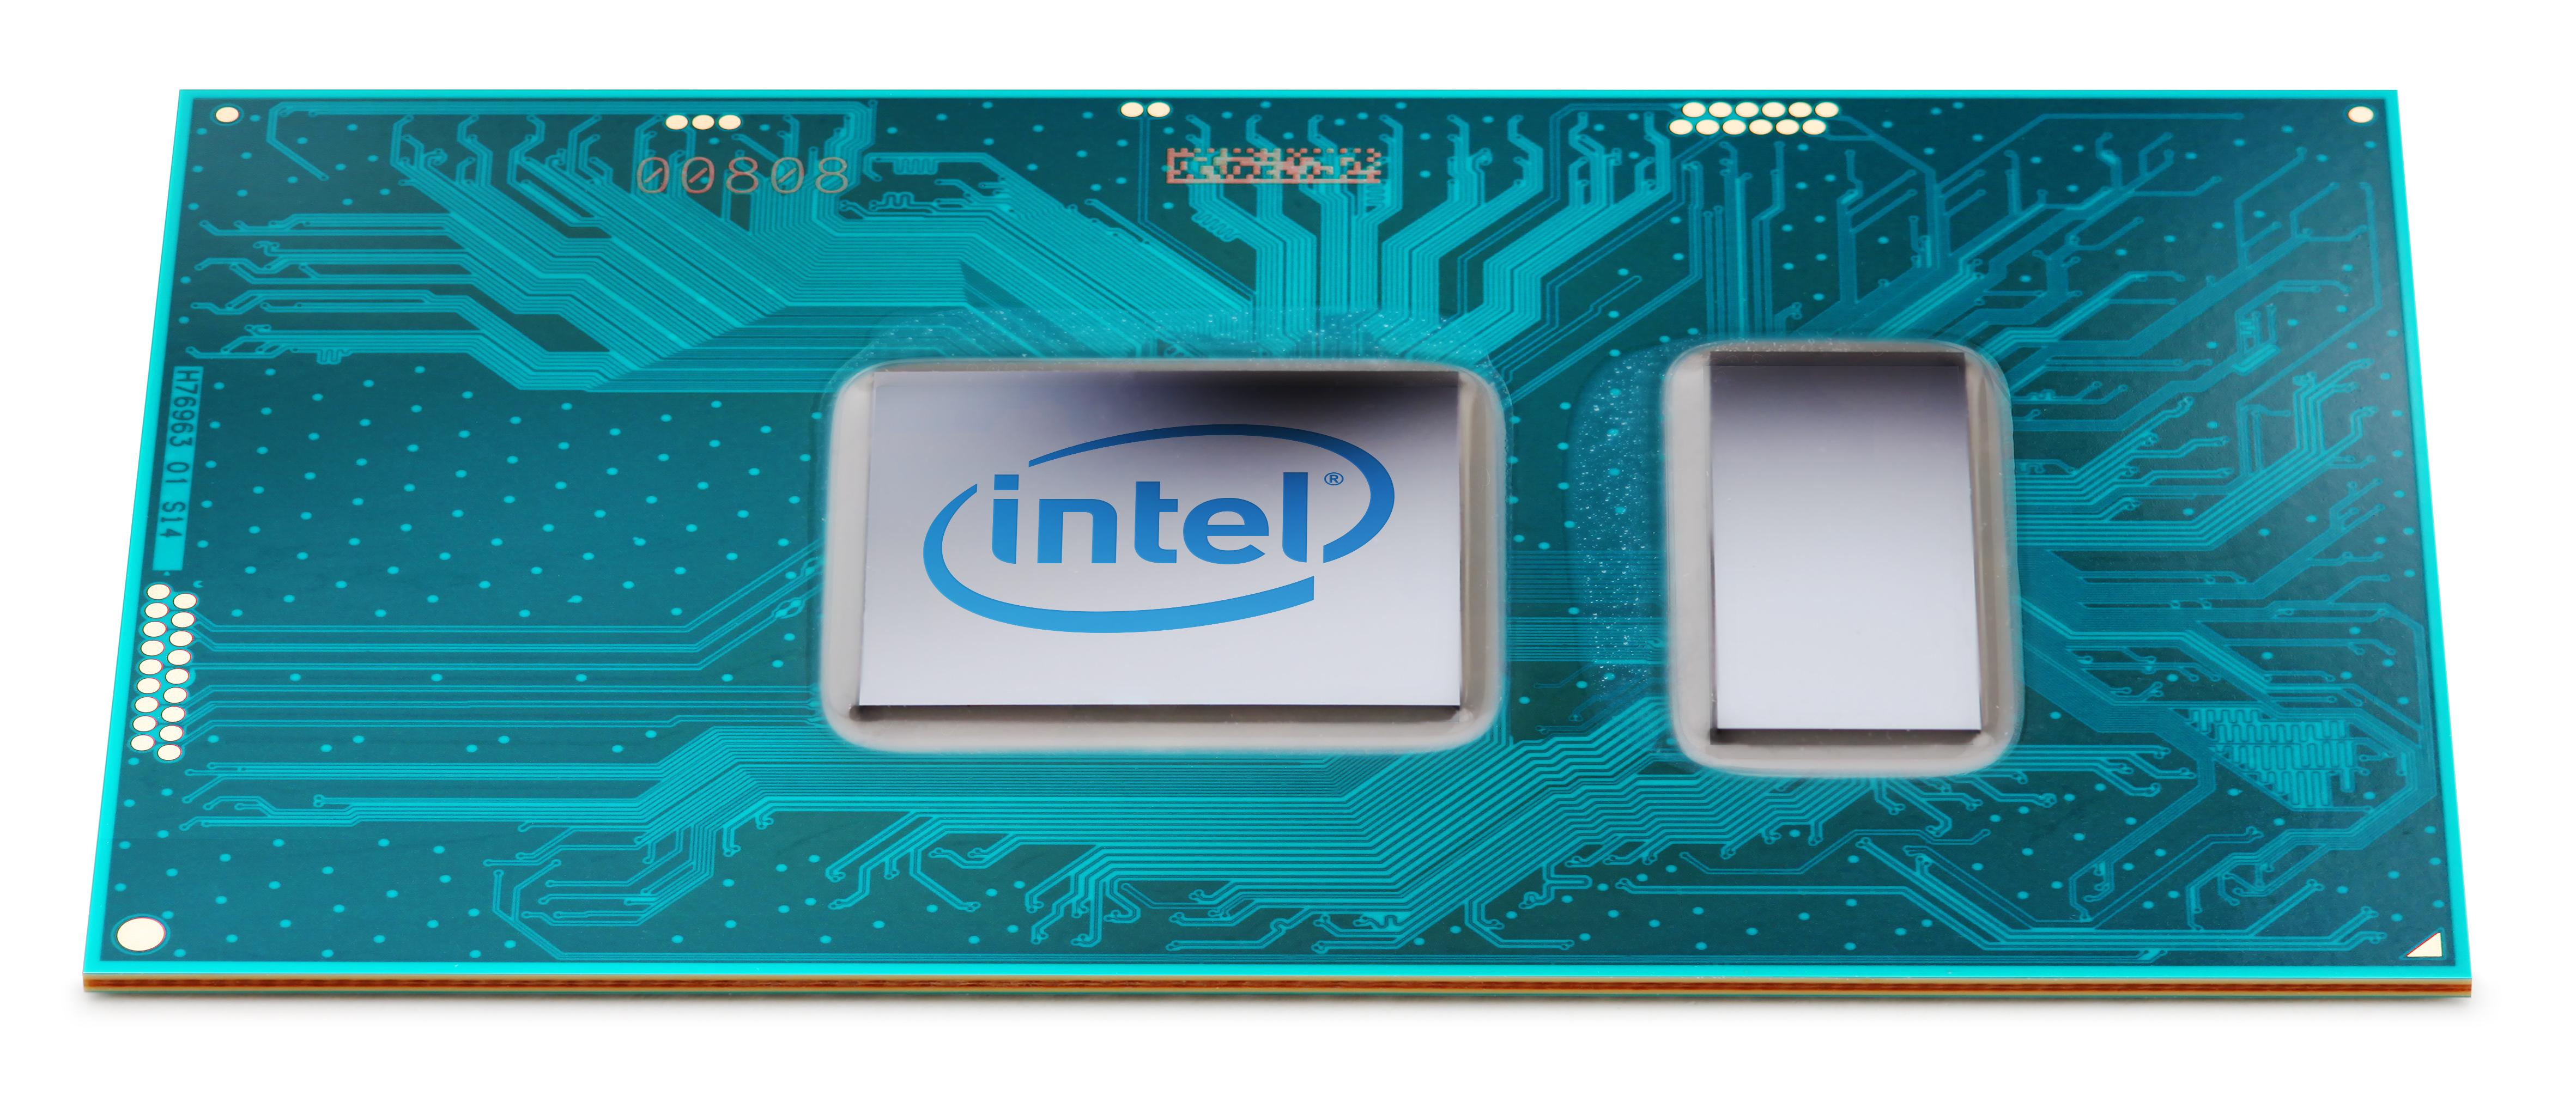 7th Gen Intel Core U-series_angle_ with logo